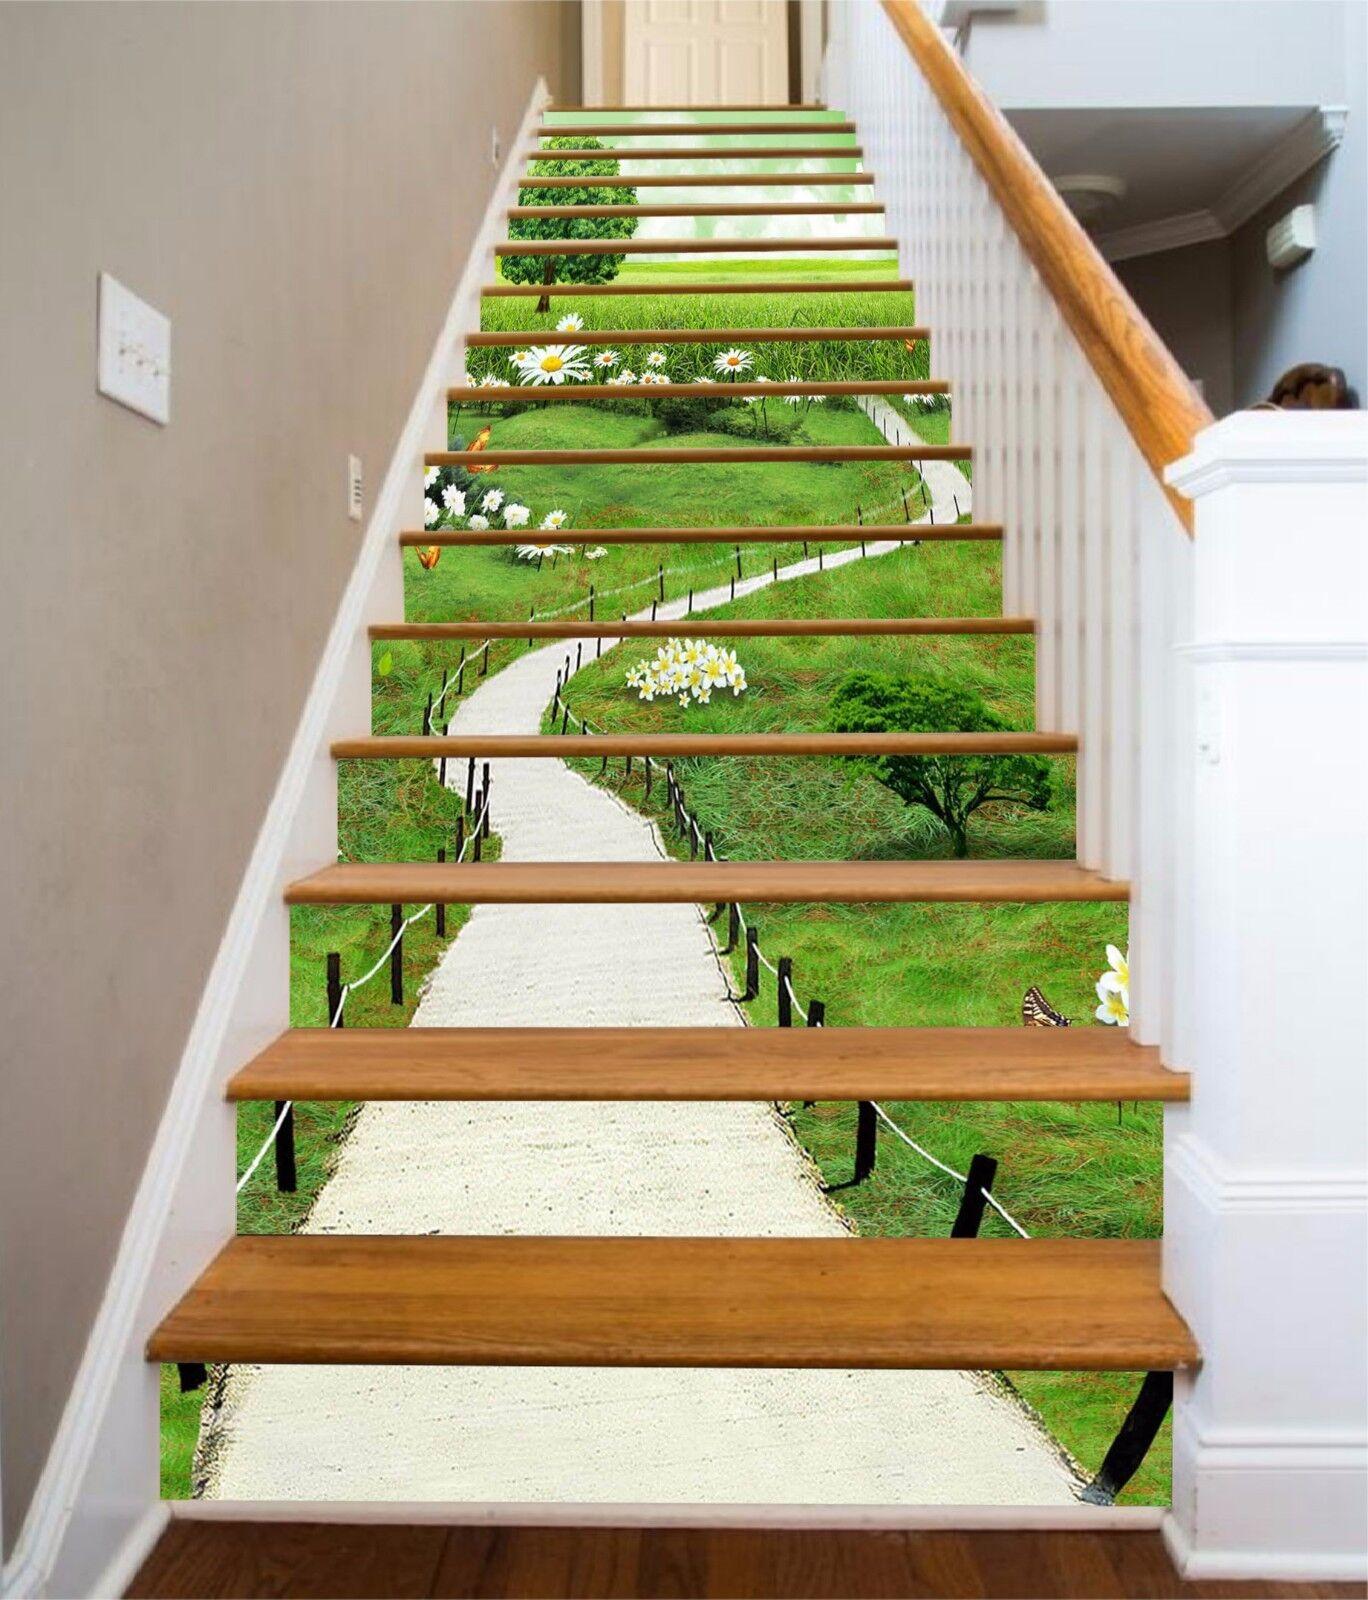 3D Lawn Flower 743 Stair Risers Decoration Photo Mural Vinyl Decal WandPapier AU